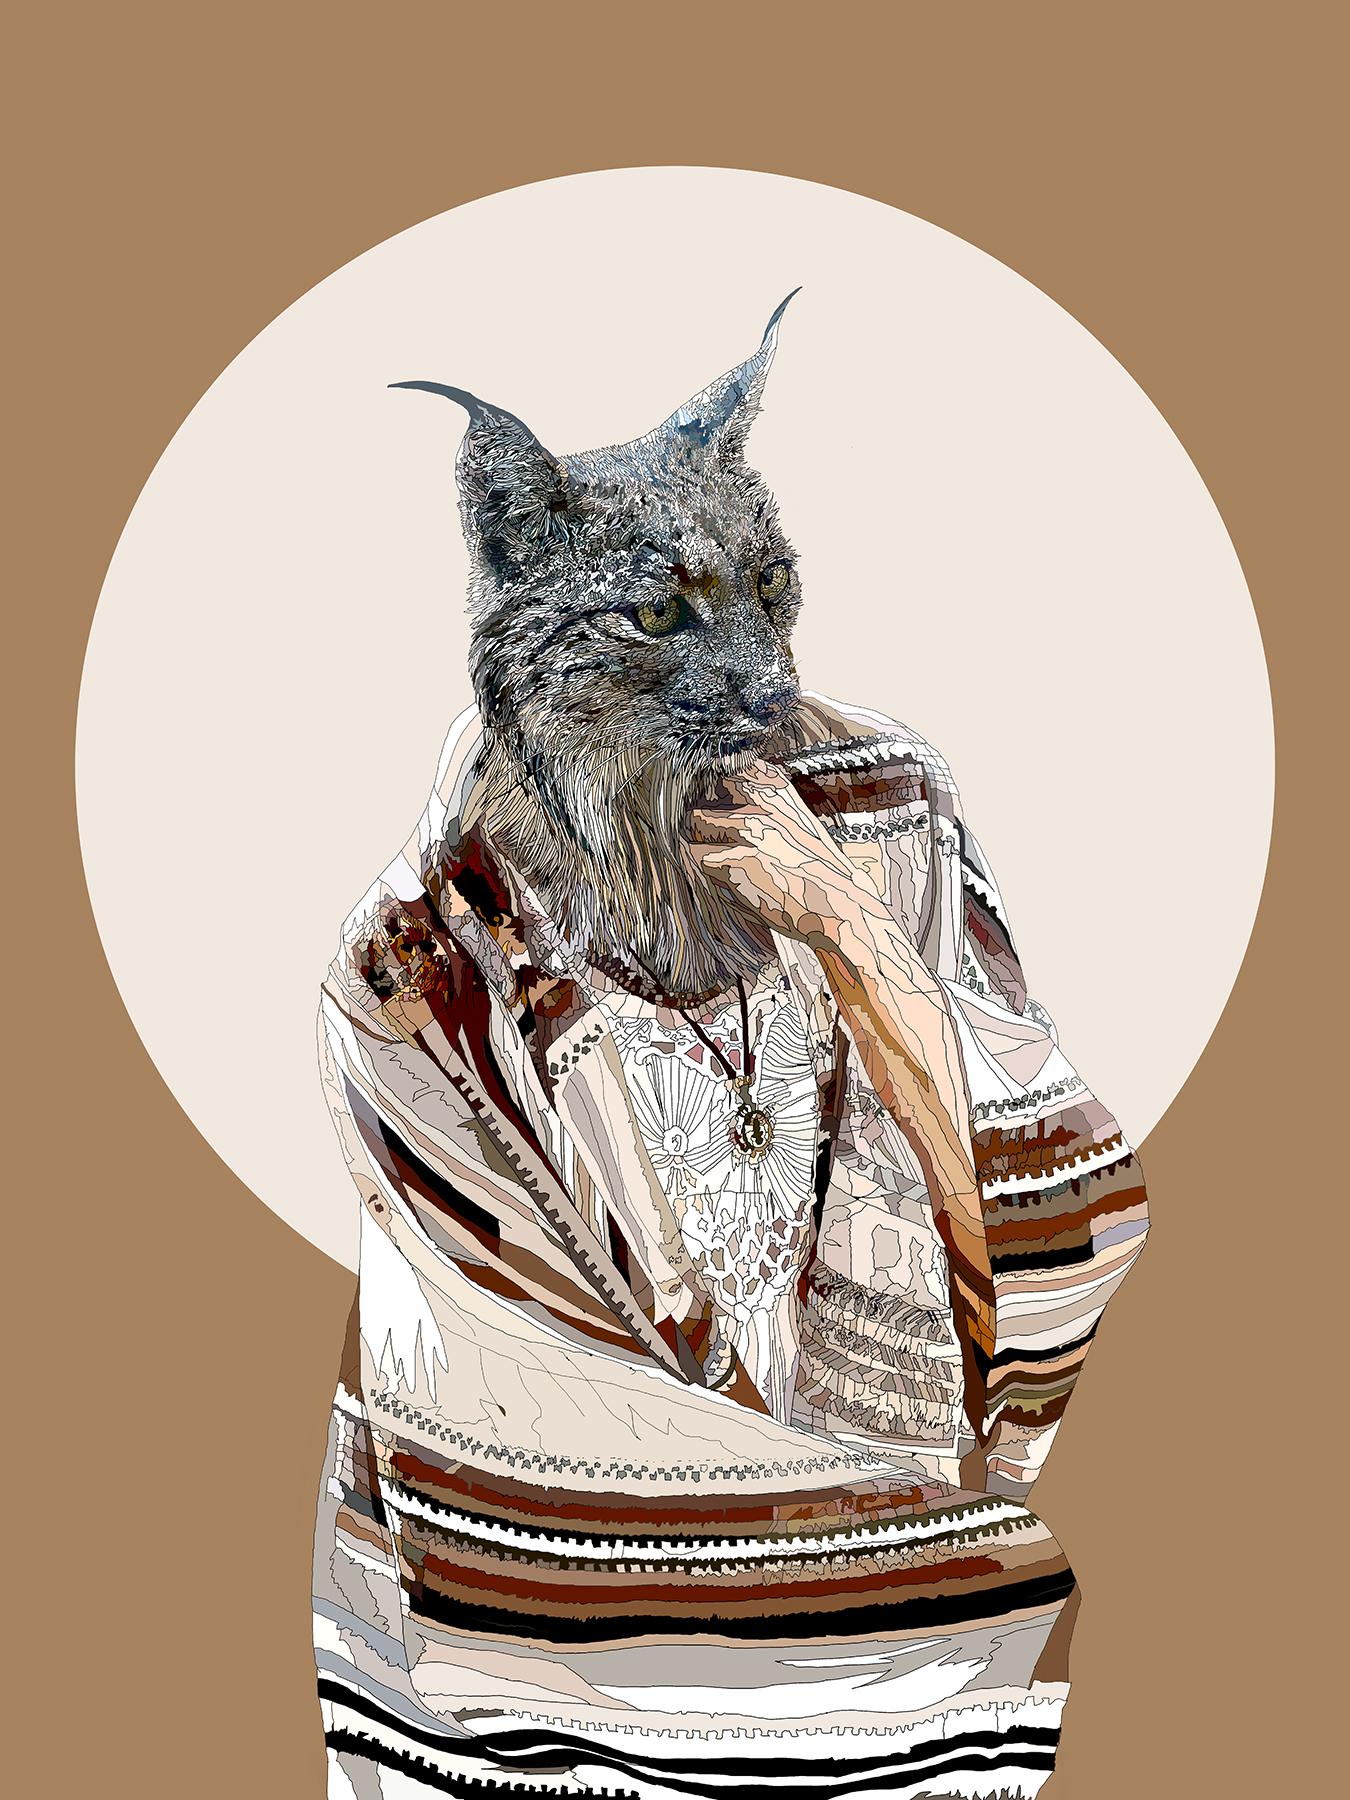 Hope Springs Eternal - Anthropomorphic art featuring an Iberian Lynx